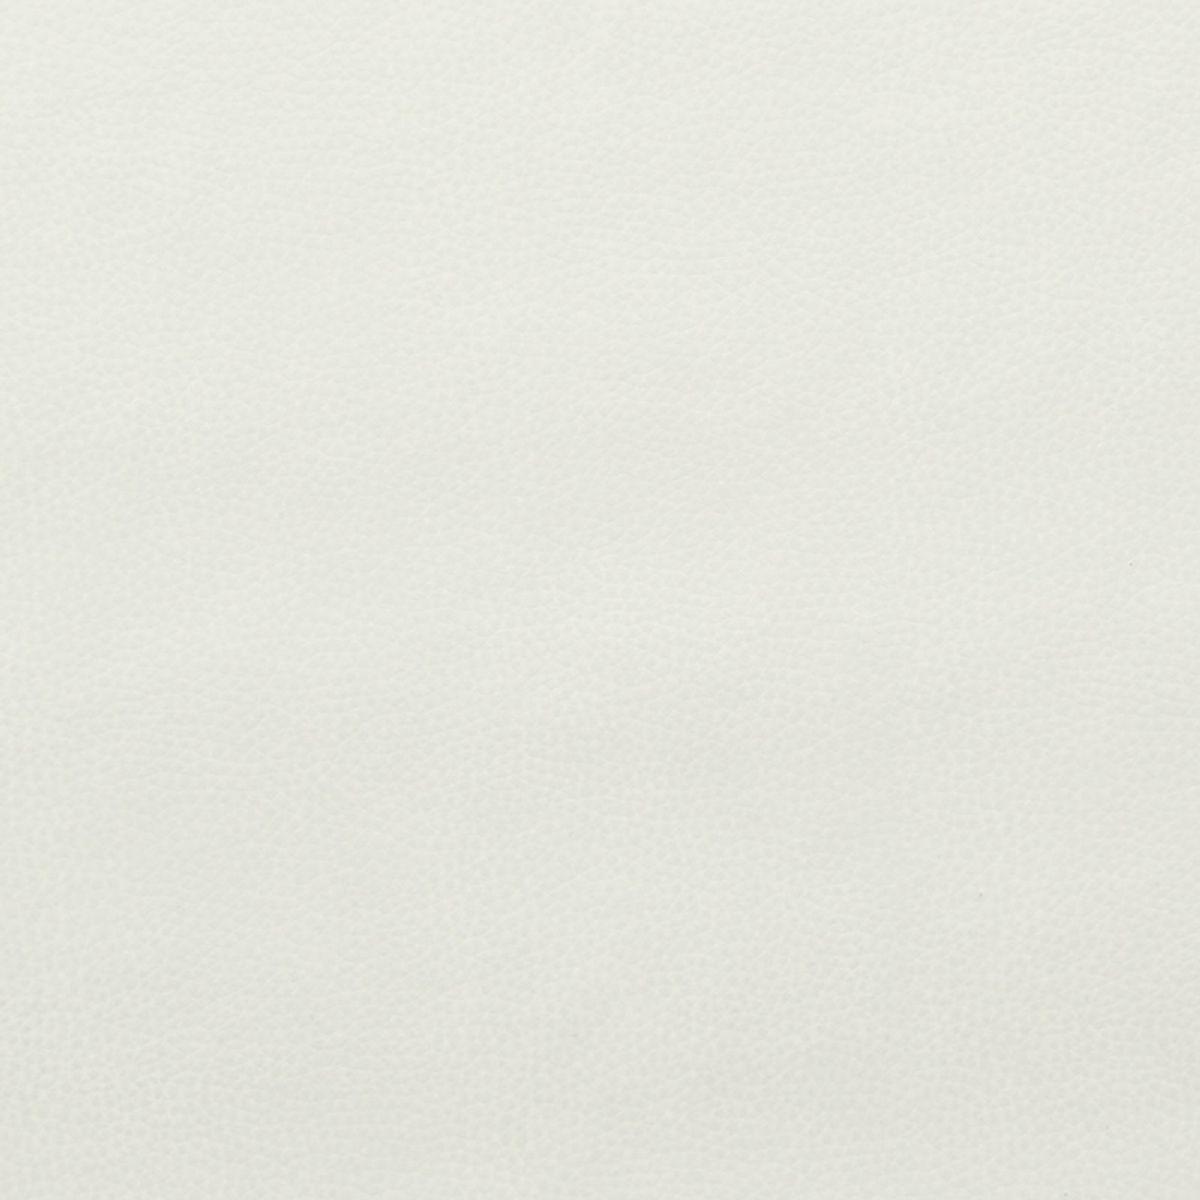 Tissus simili cuir - Blanc